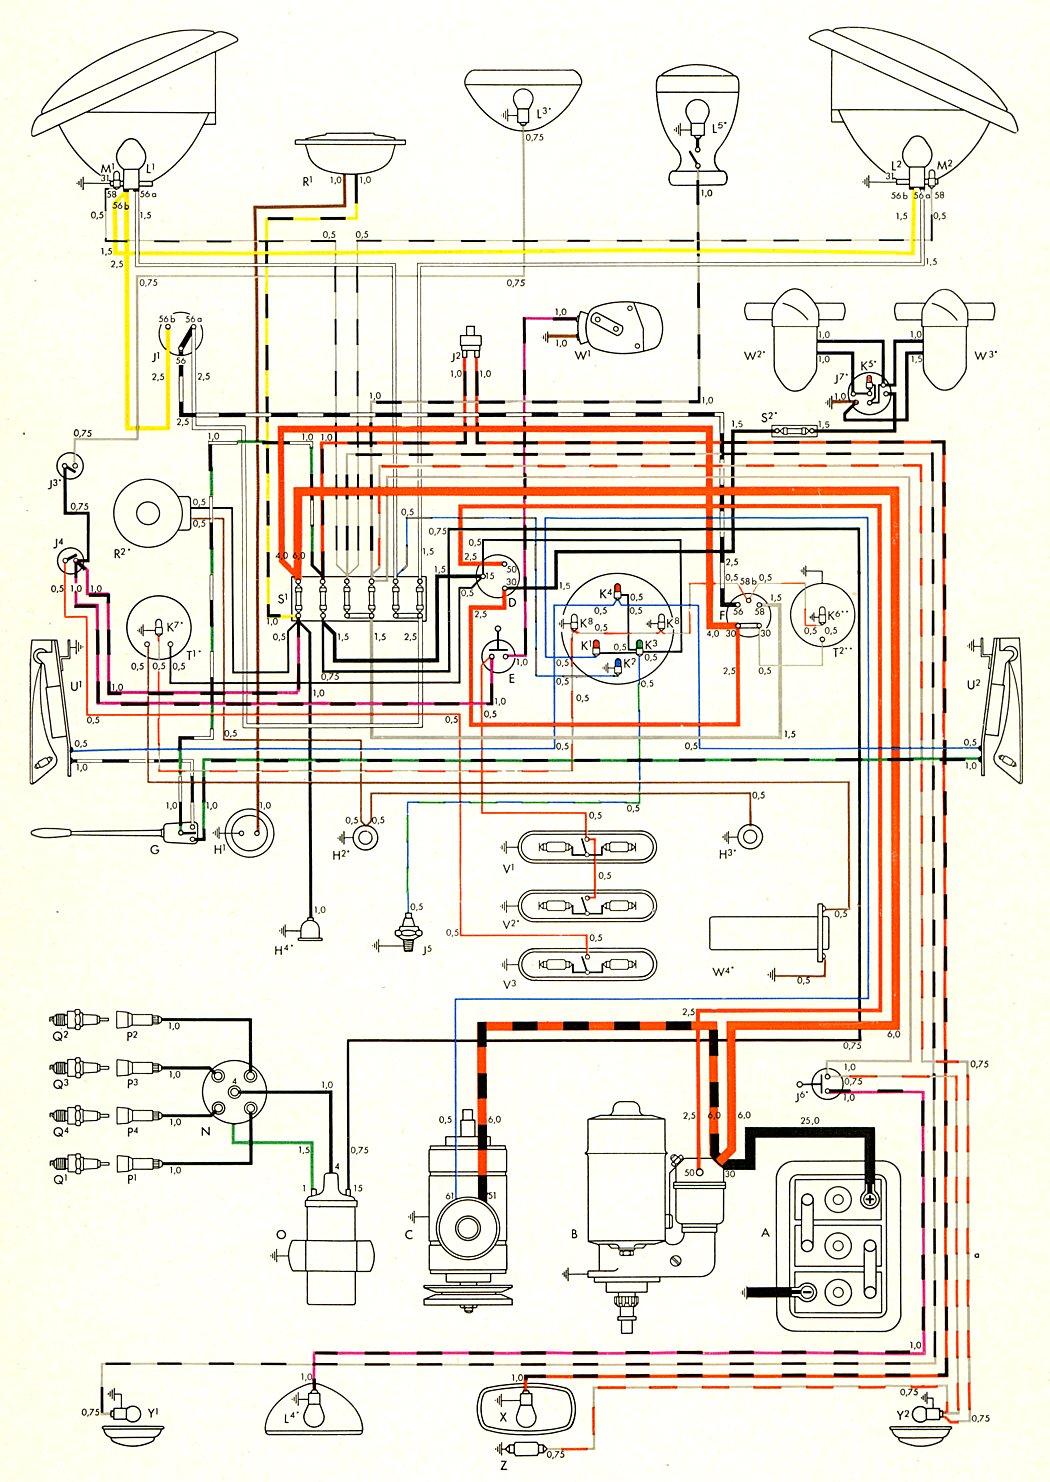 hight resolution of 98 vw golf fuse box diagram